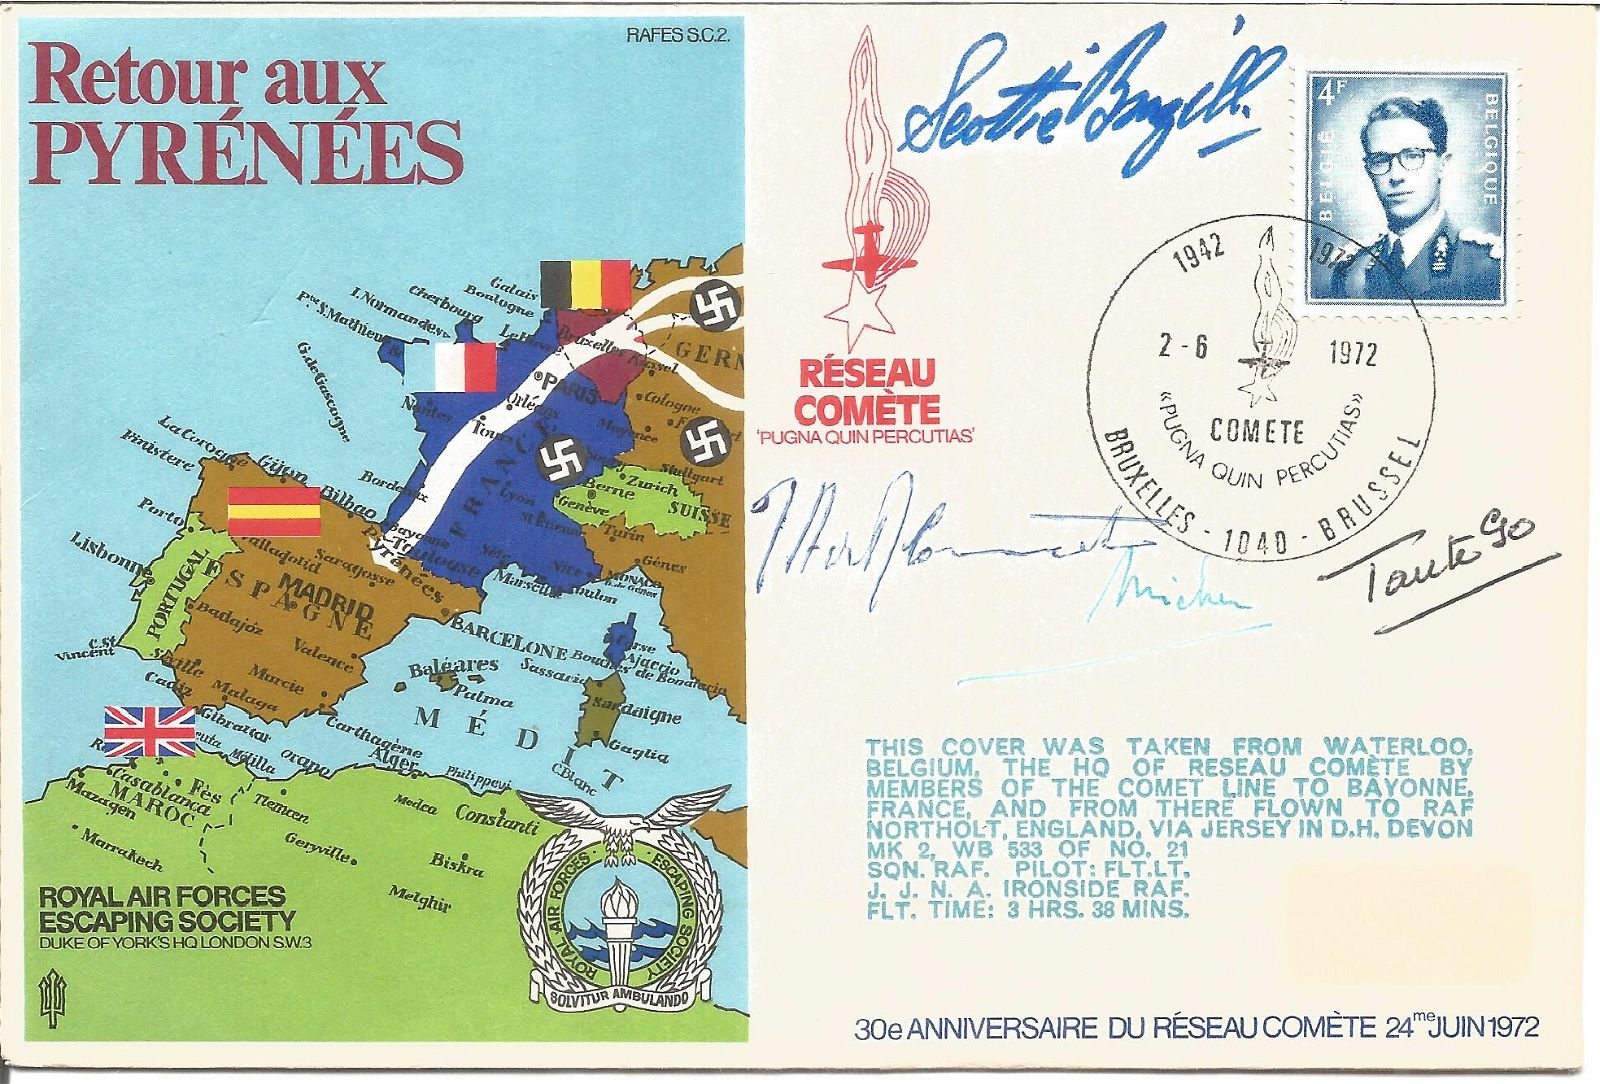 Retour aux Pyrenees RAFES signed RAF cover SC2. Taken